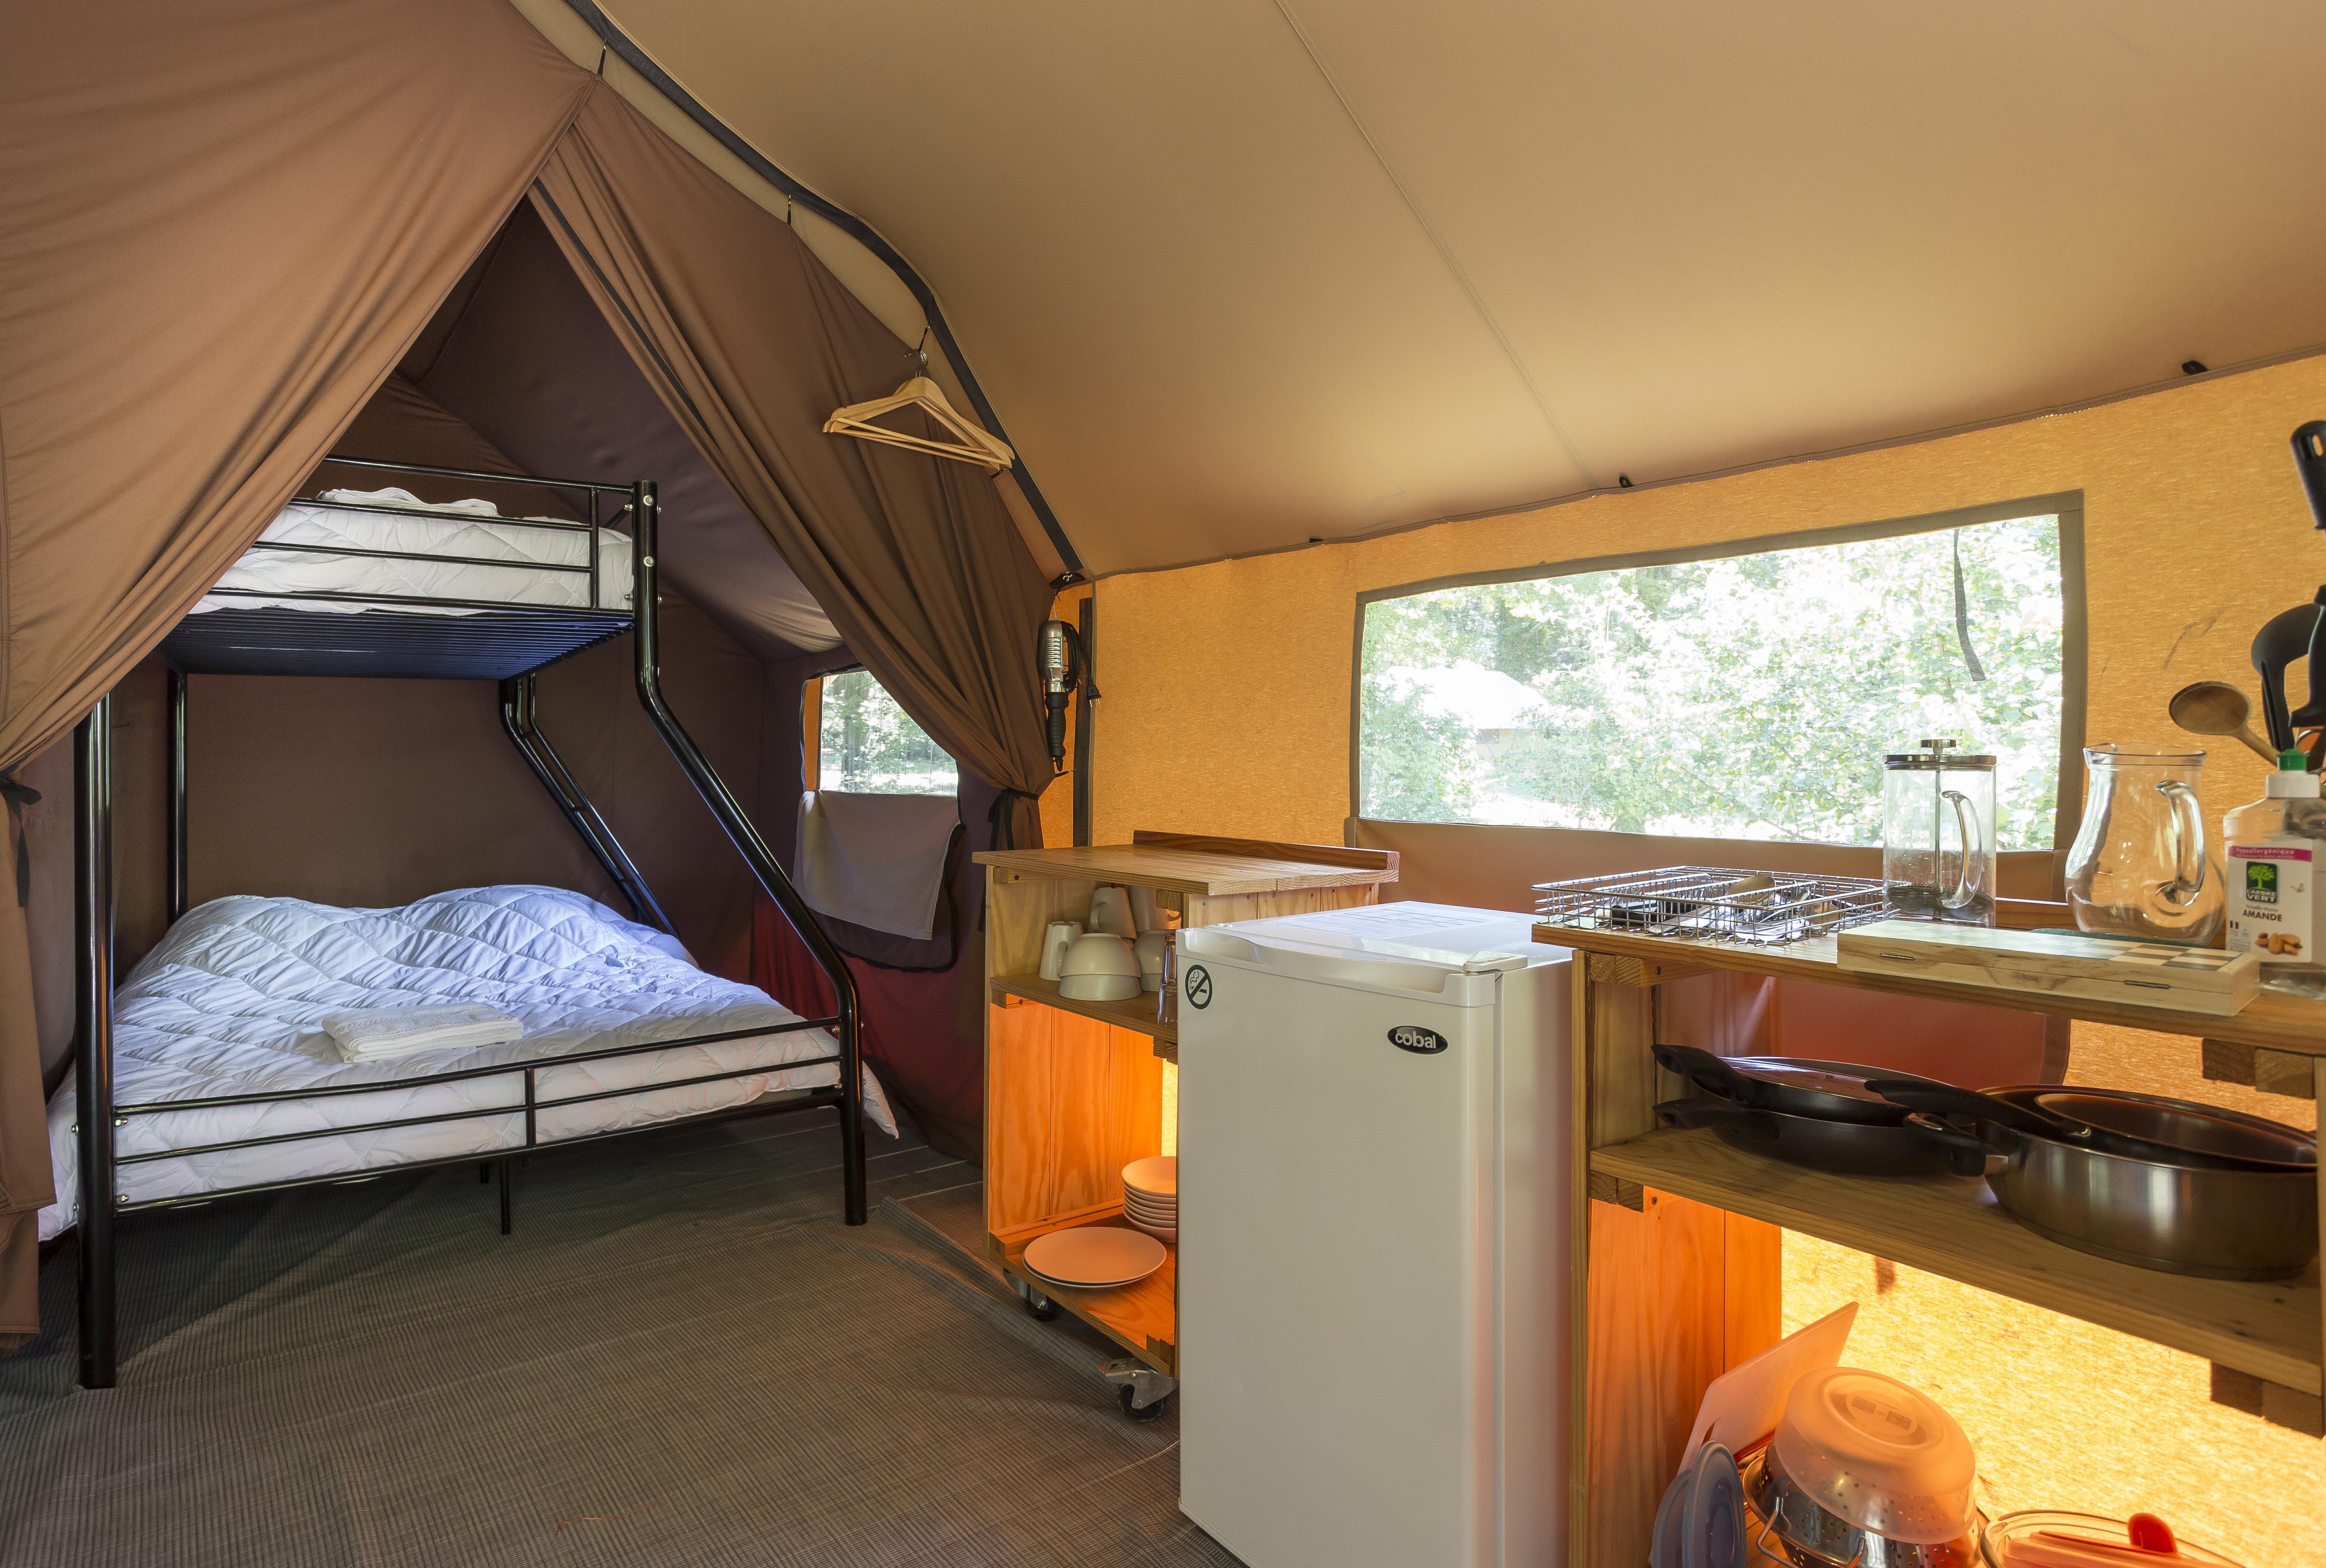 Location - Tente Canadienne Ii - Camping La Pinède